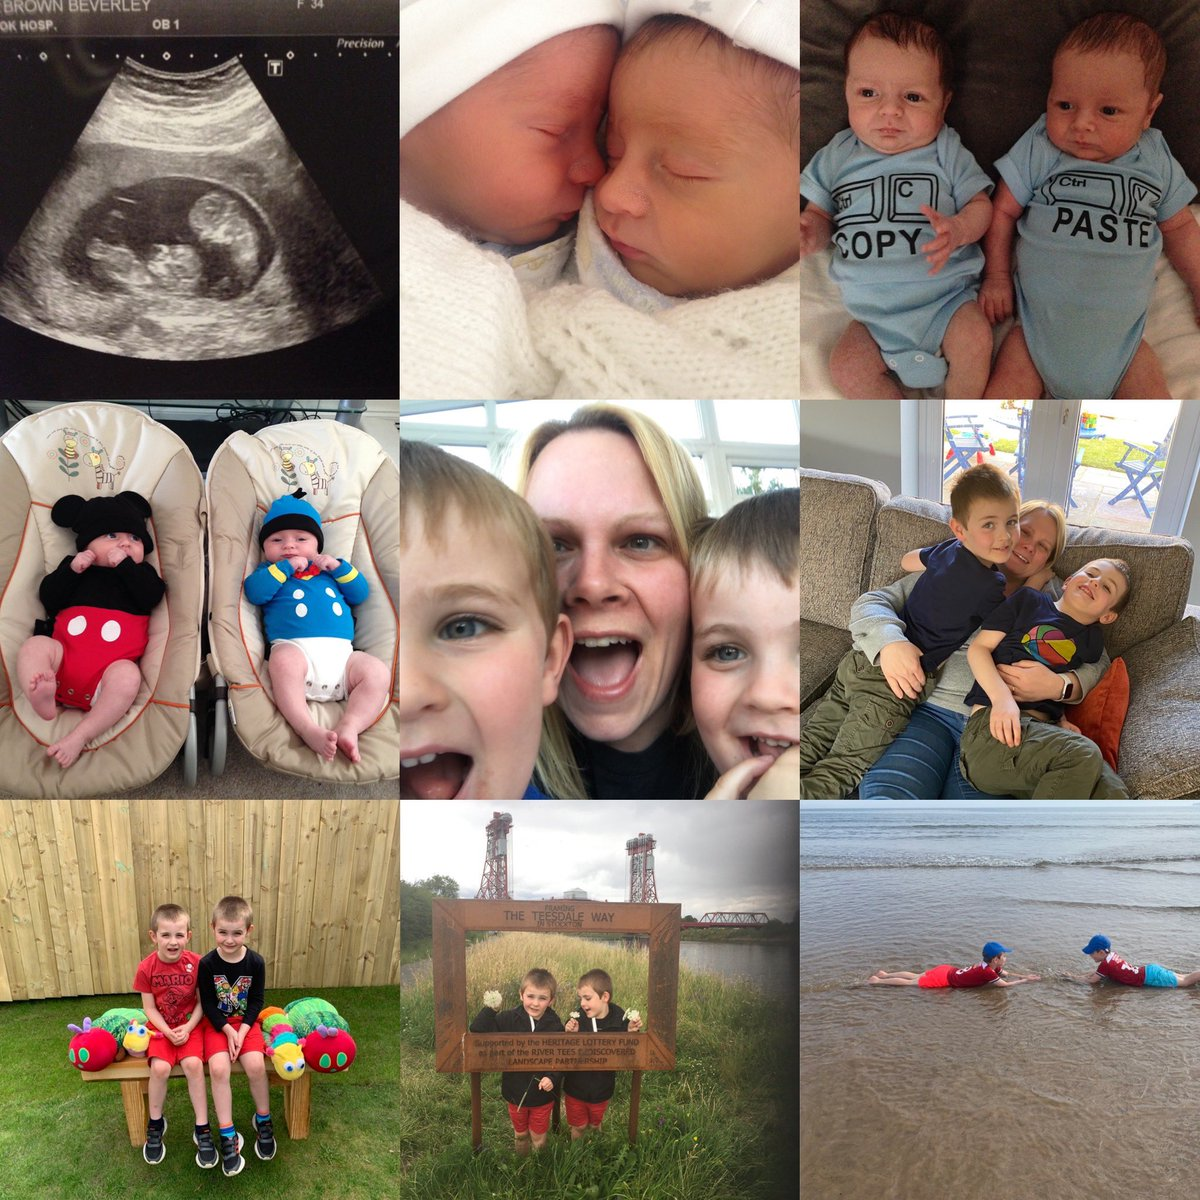 Happy National Twins Day! #twinmum #twinmumlife #identicaltwins #mybeans #myboys #NationalTwinsDaypic.twitter.com/t4CnQrEiHd